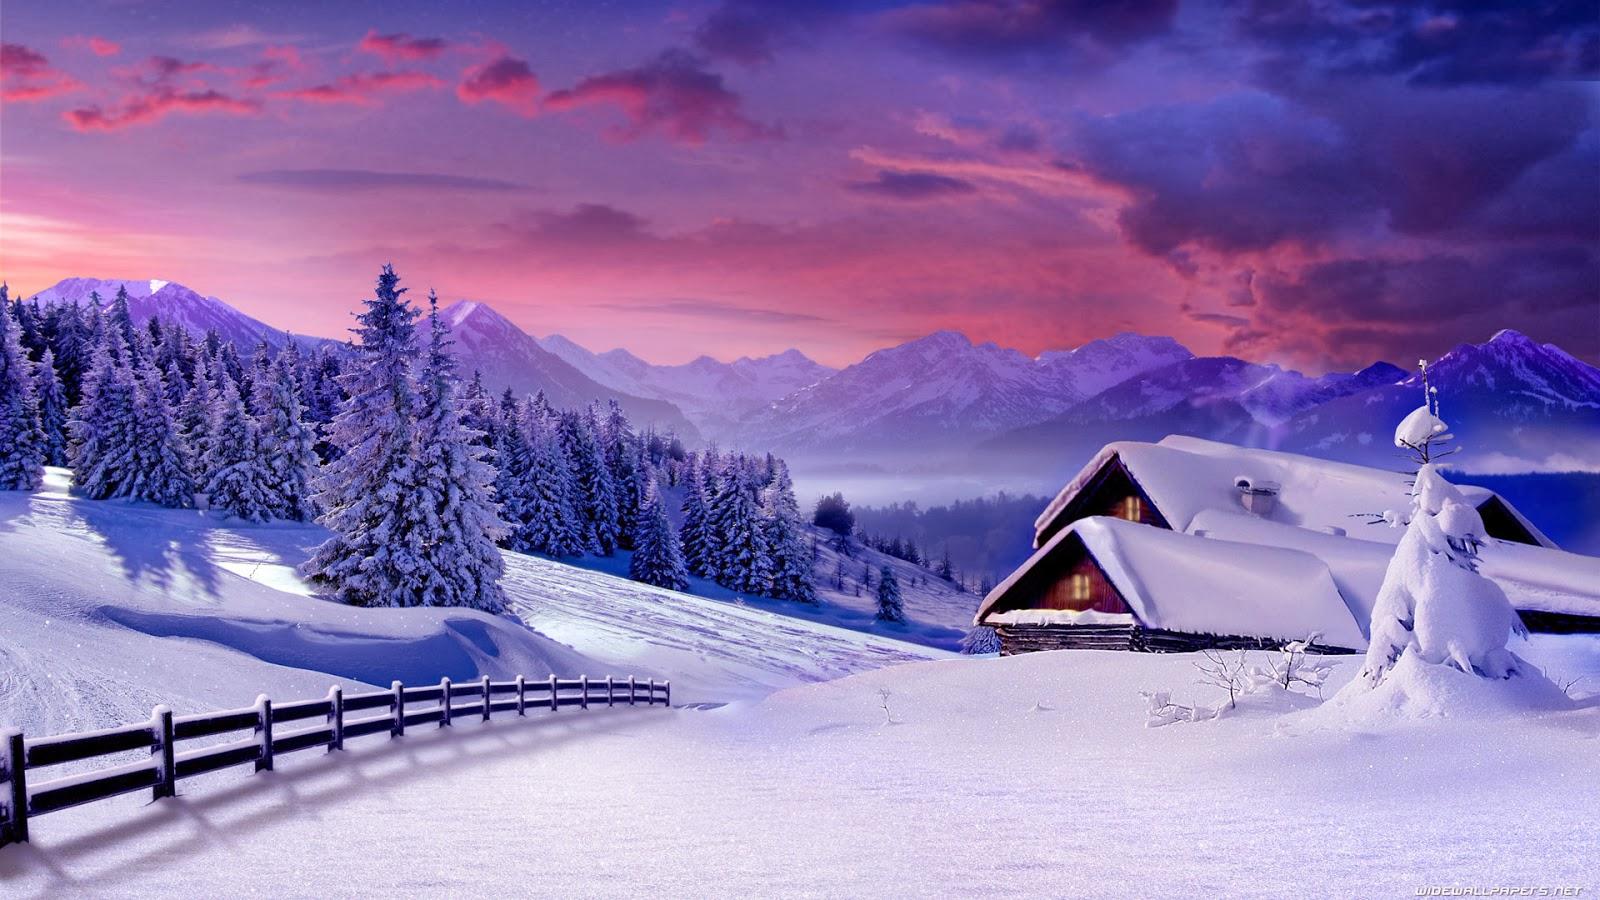 48 Snow Scene Wallpaper For Desktop On Wallpapersafari